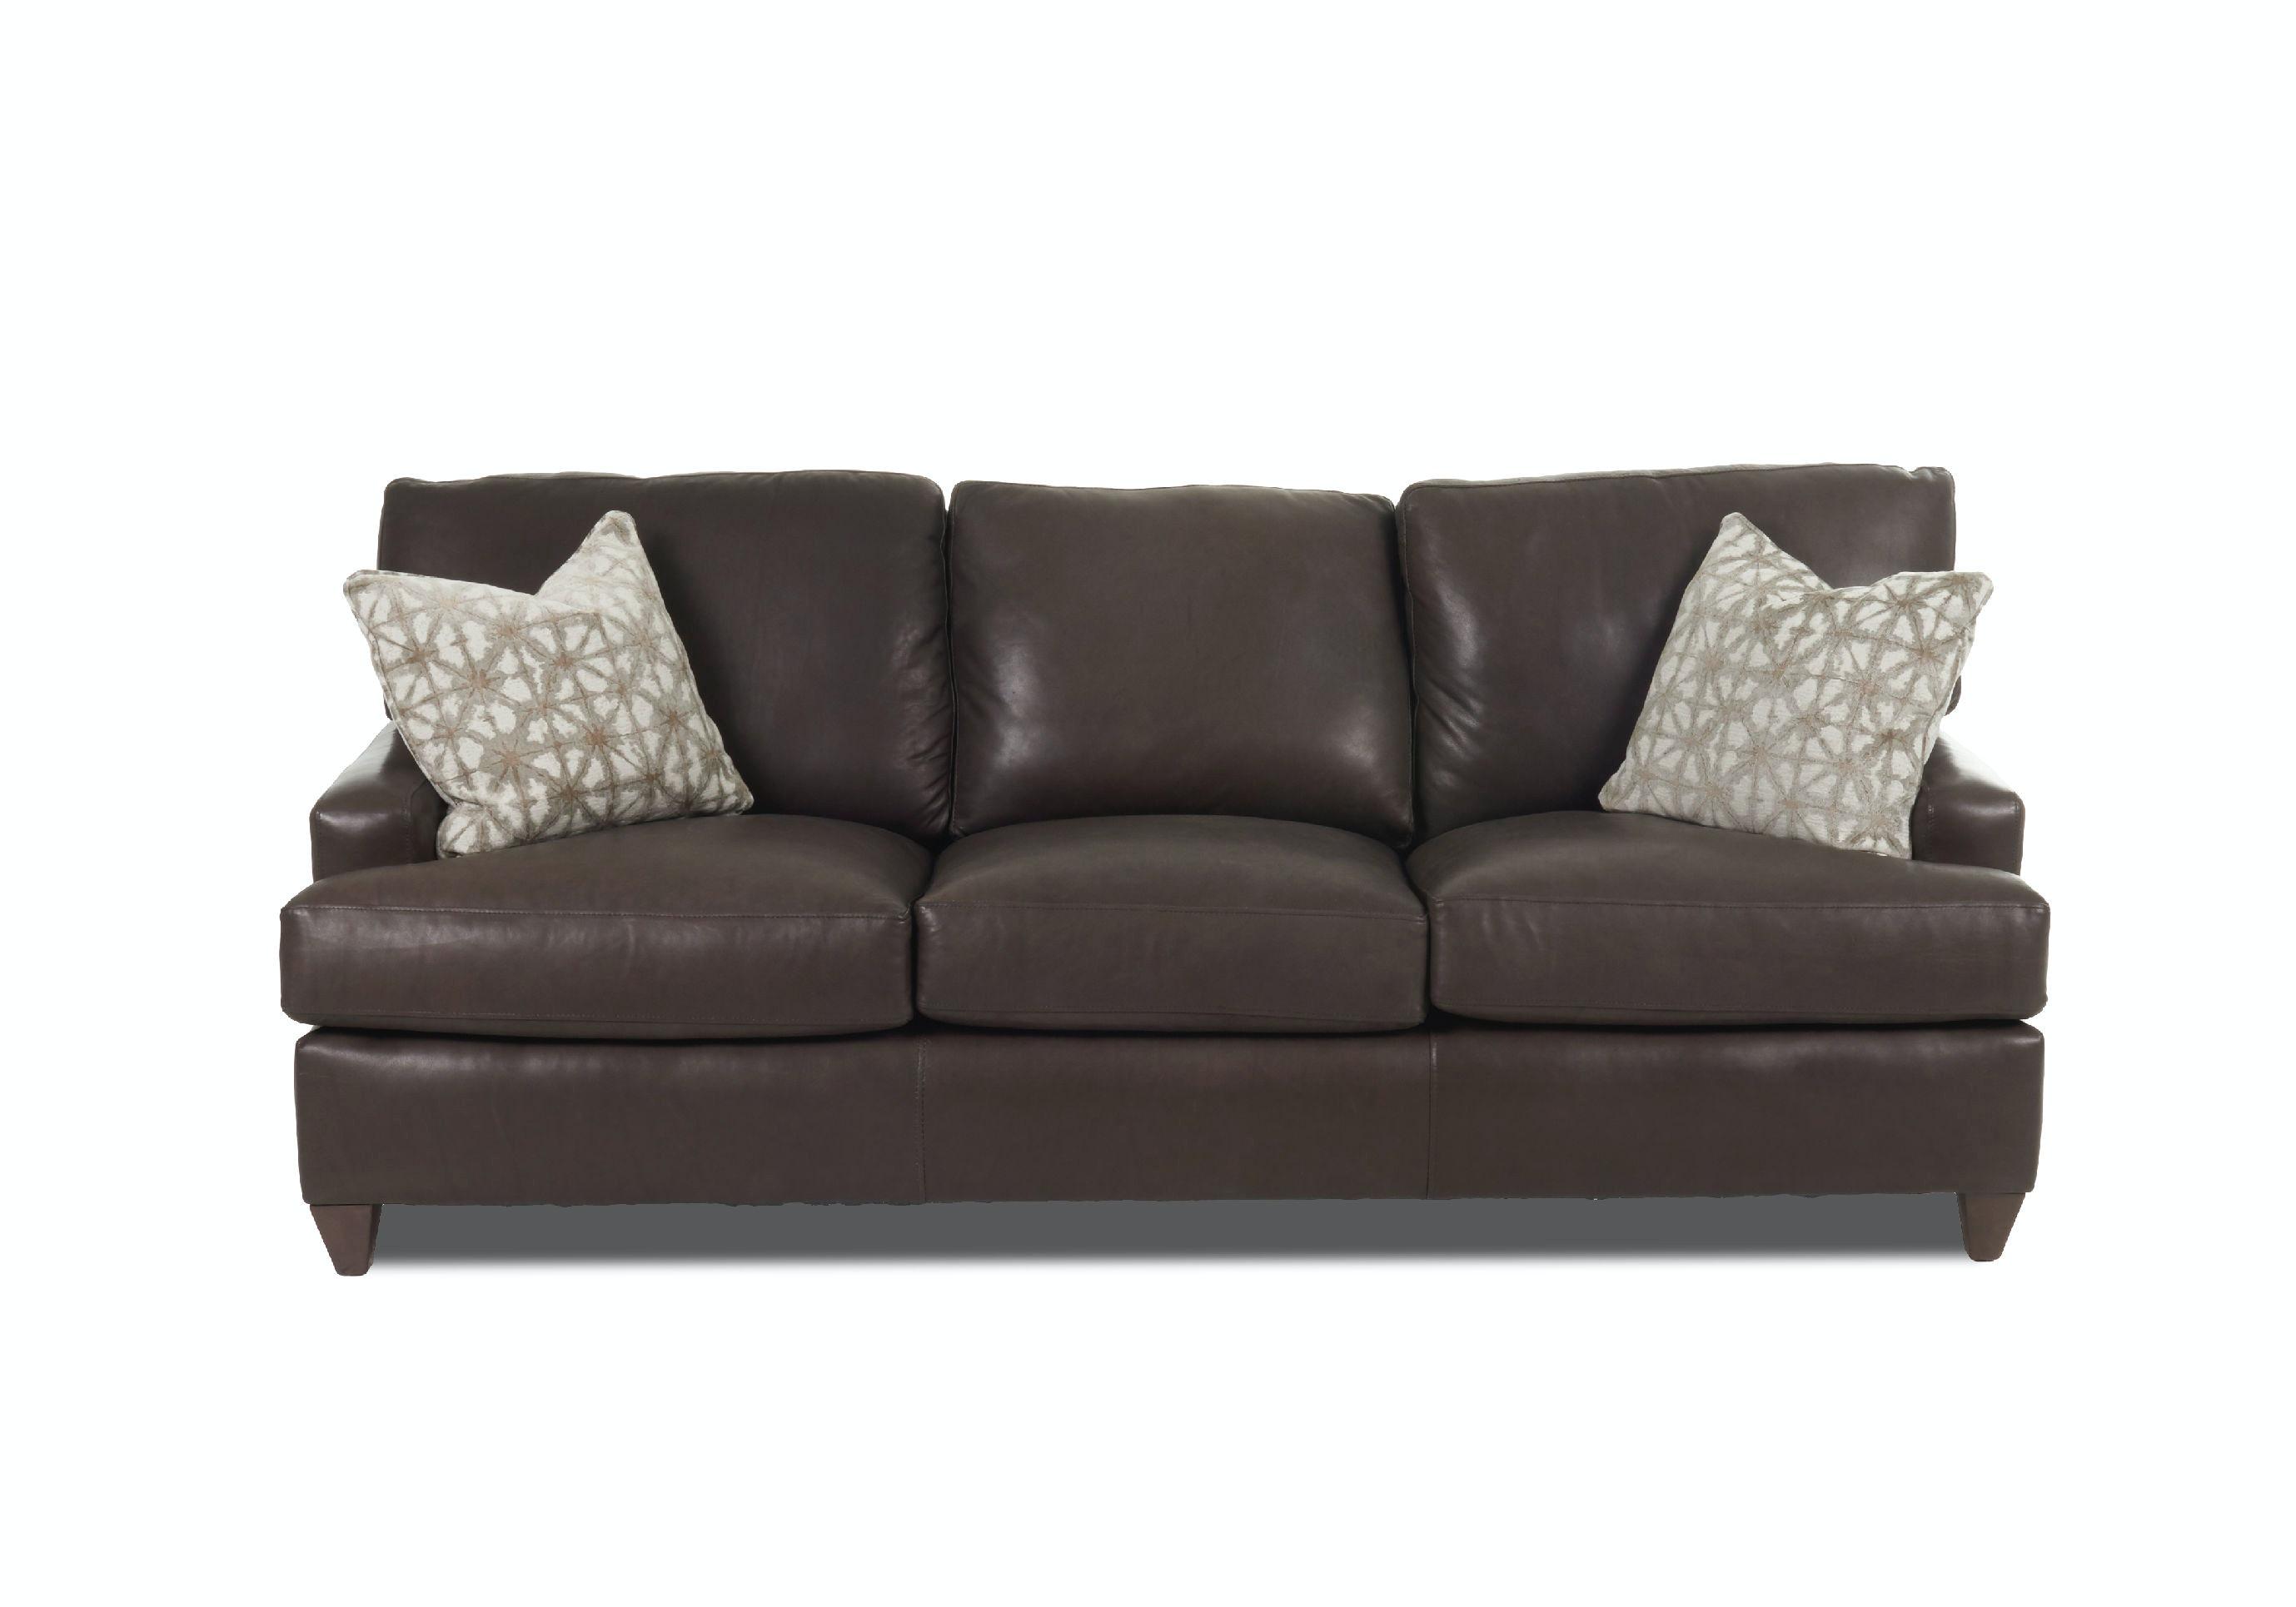 Klaussner Living Room CASSIO LD28000AP S   Furniture Kingdom   Gainesville,  FL